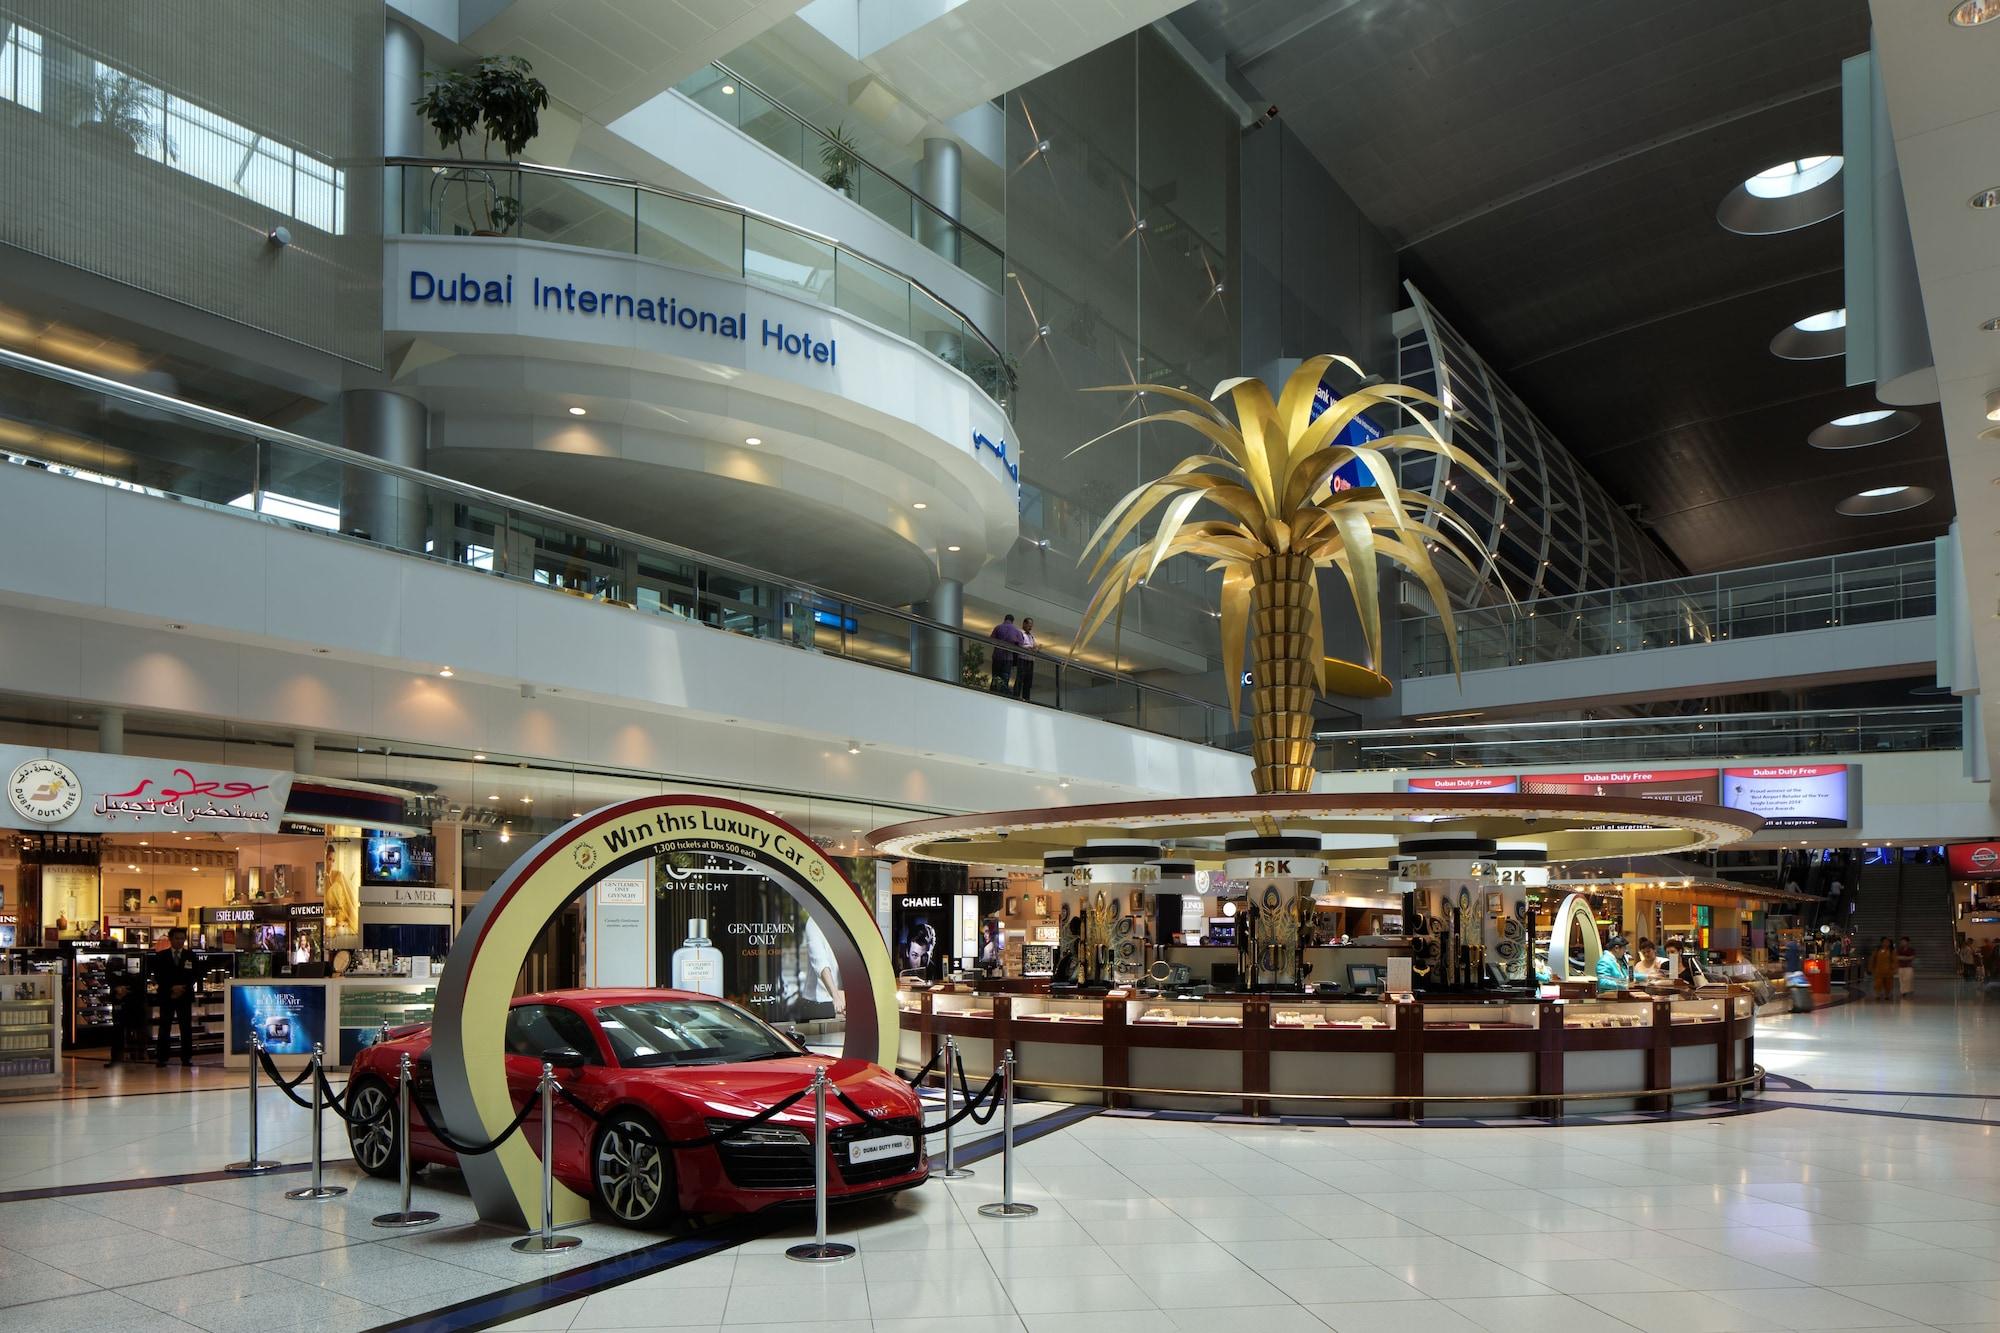 Dubai International Airport Terminal Hotel,